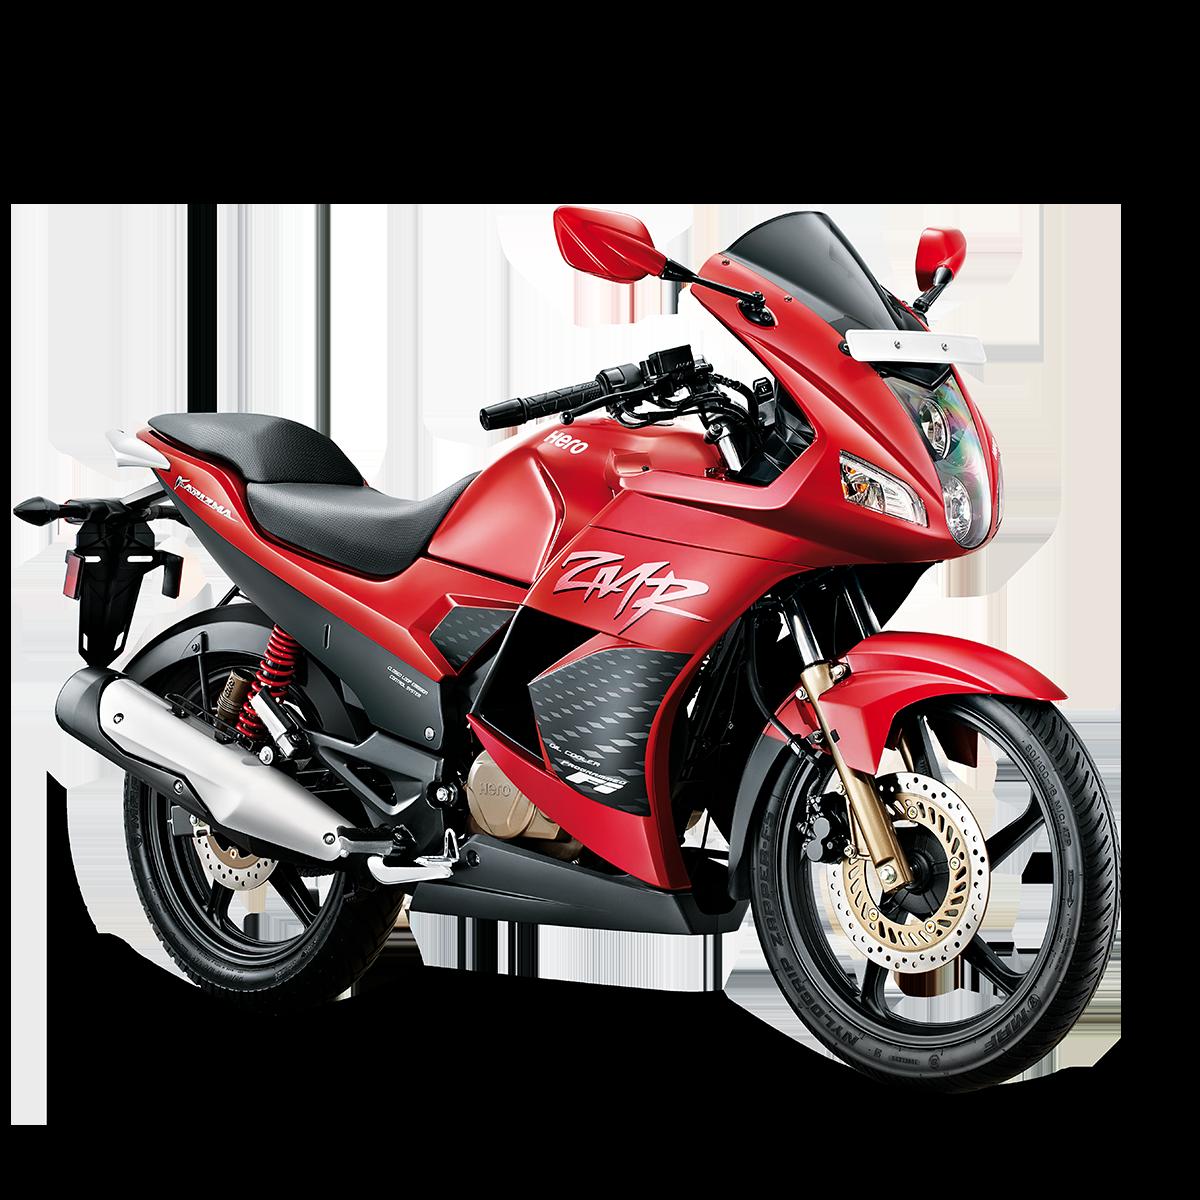 KARIZMA ZMR - Motor: 230cc / Potencia: 20 bhpPrecio: $2,650.00